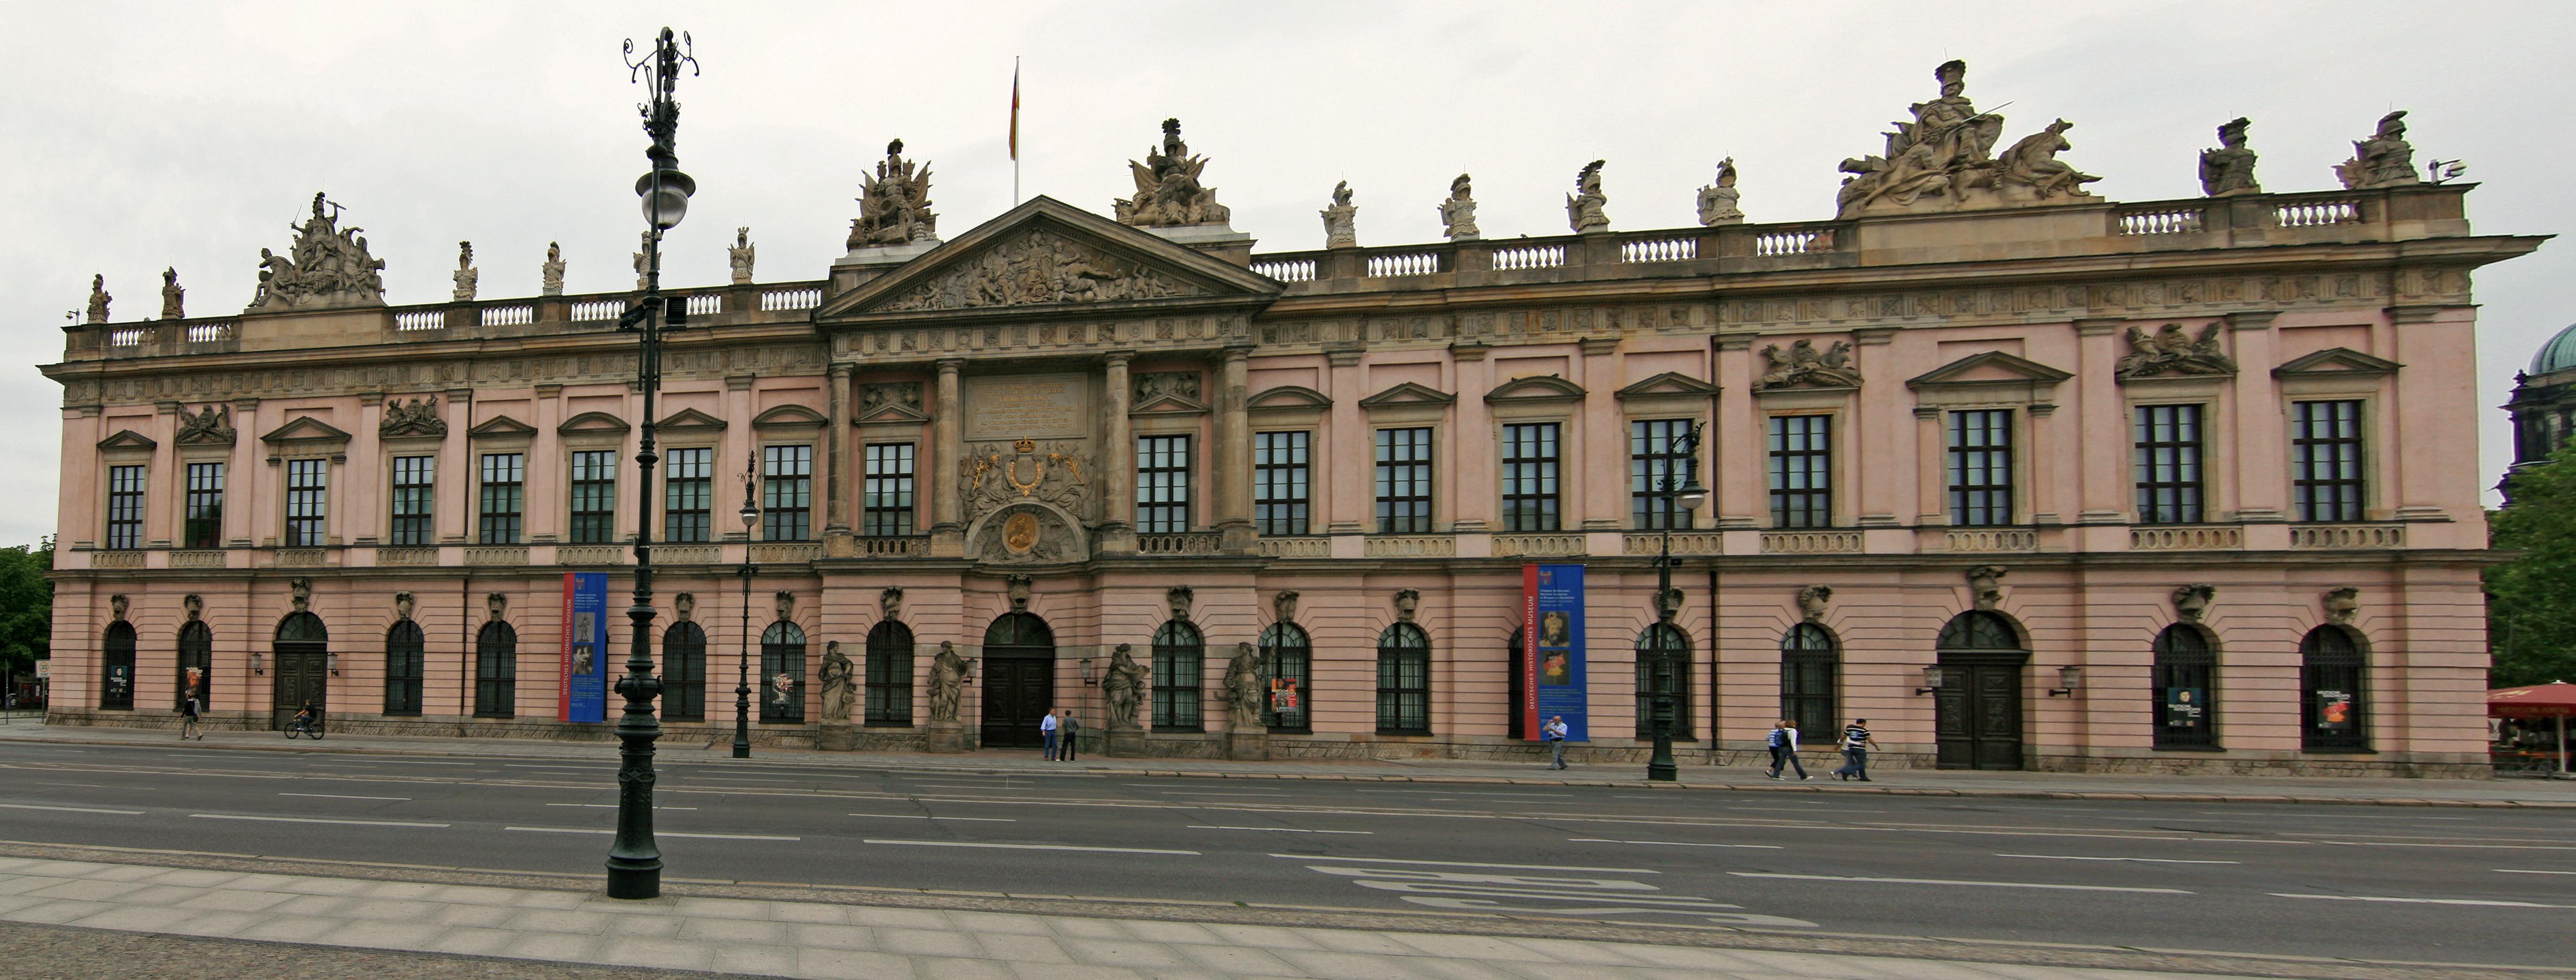 https://upload.wikimedia.org/wikipedia/commons/3/37/Deutsches_Historisches_Museum_Berlin.jpg